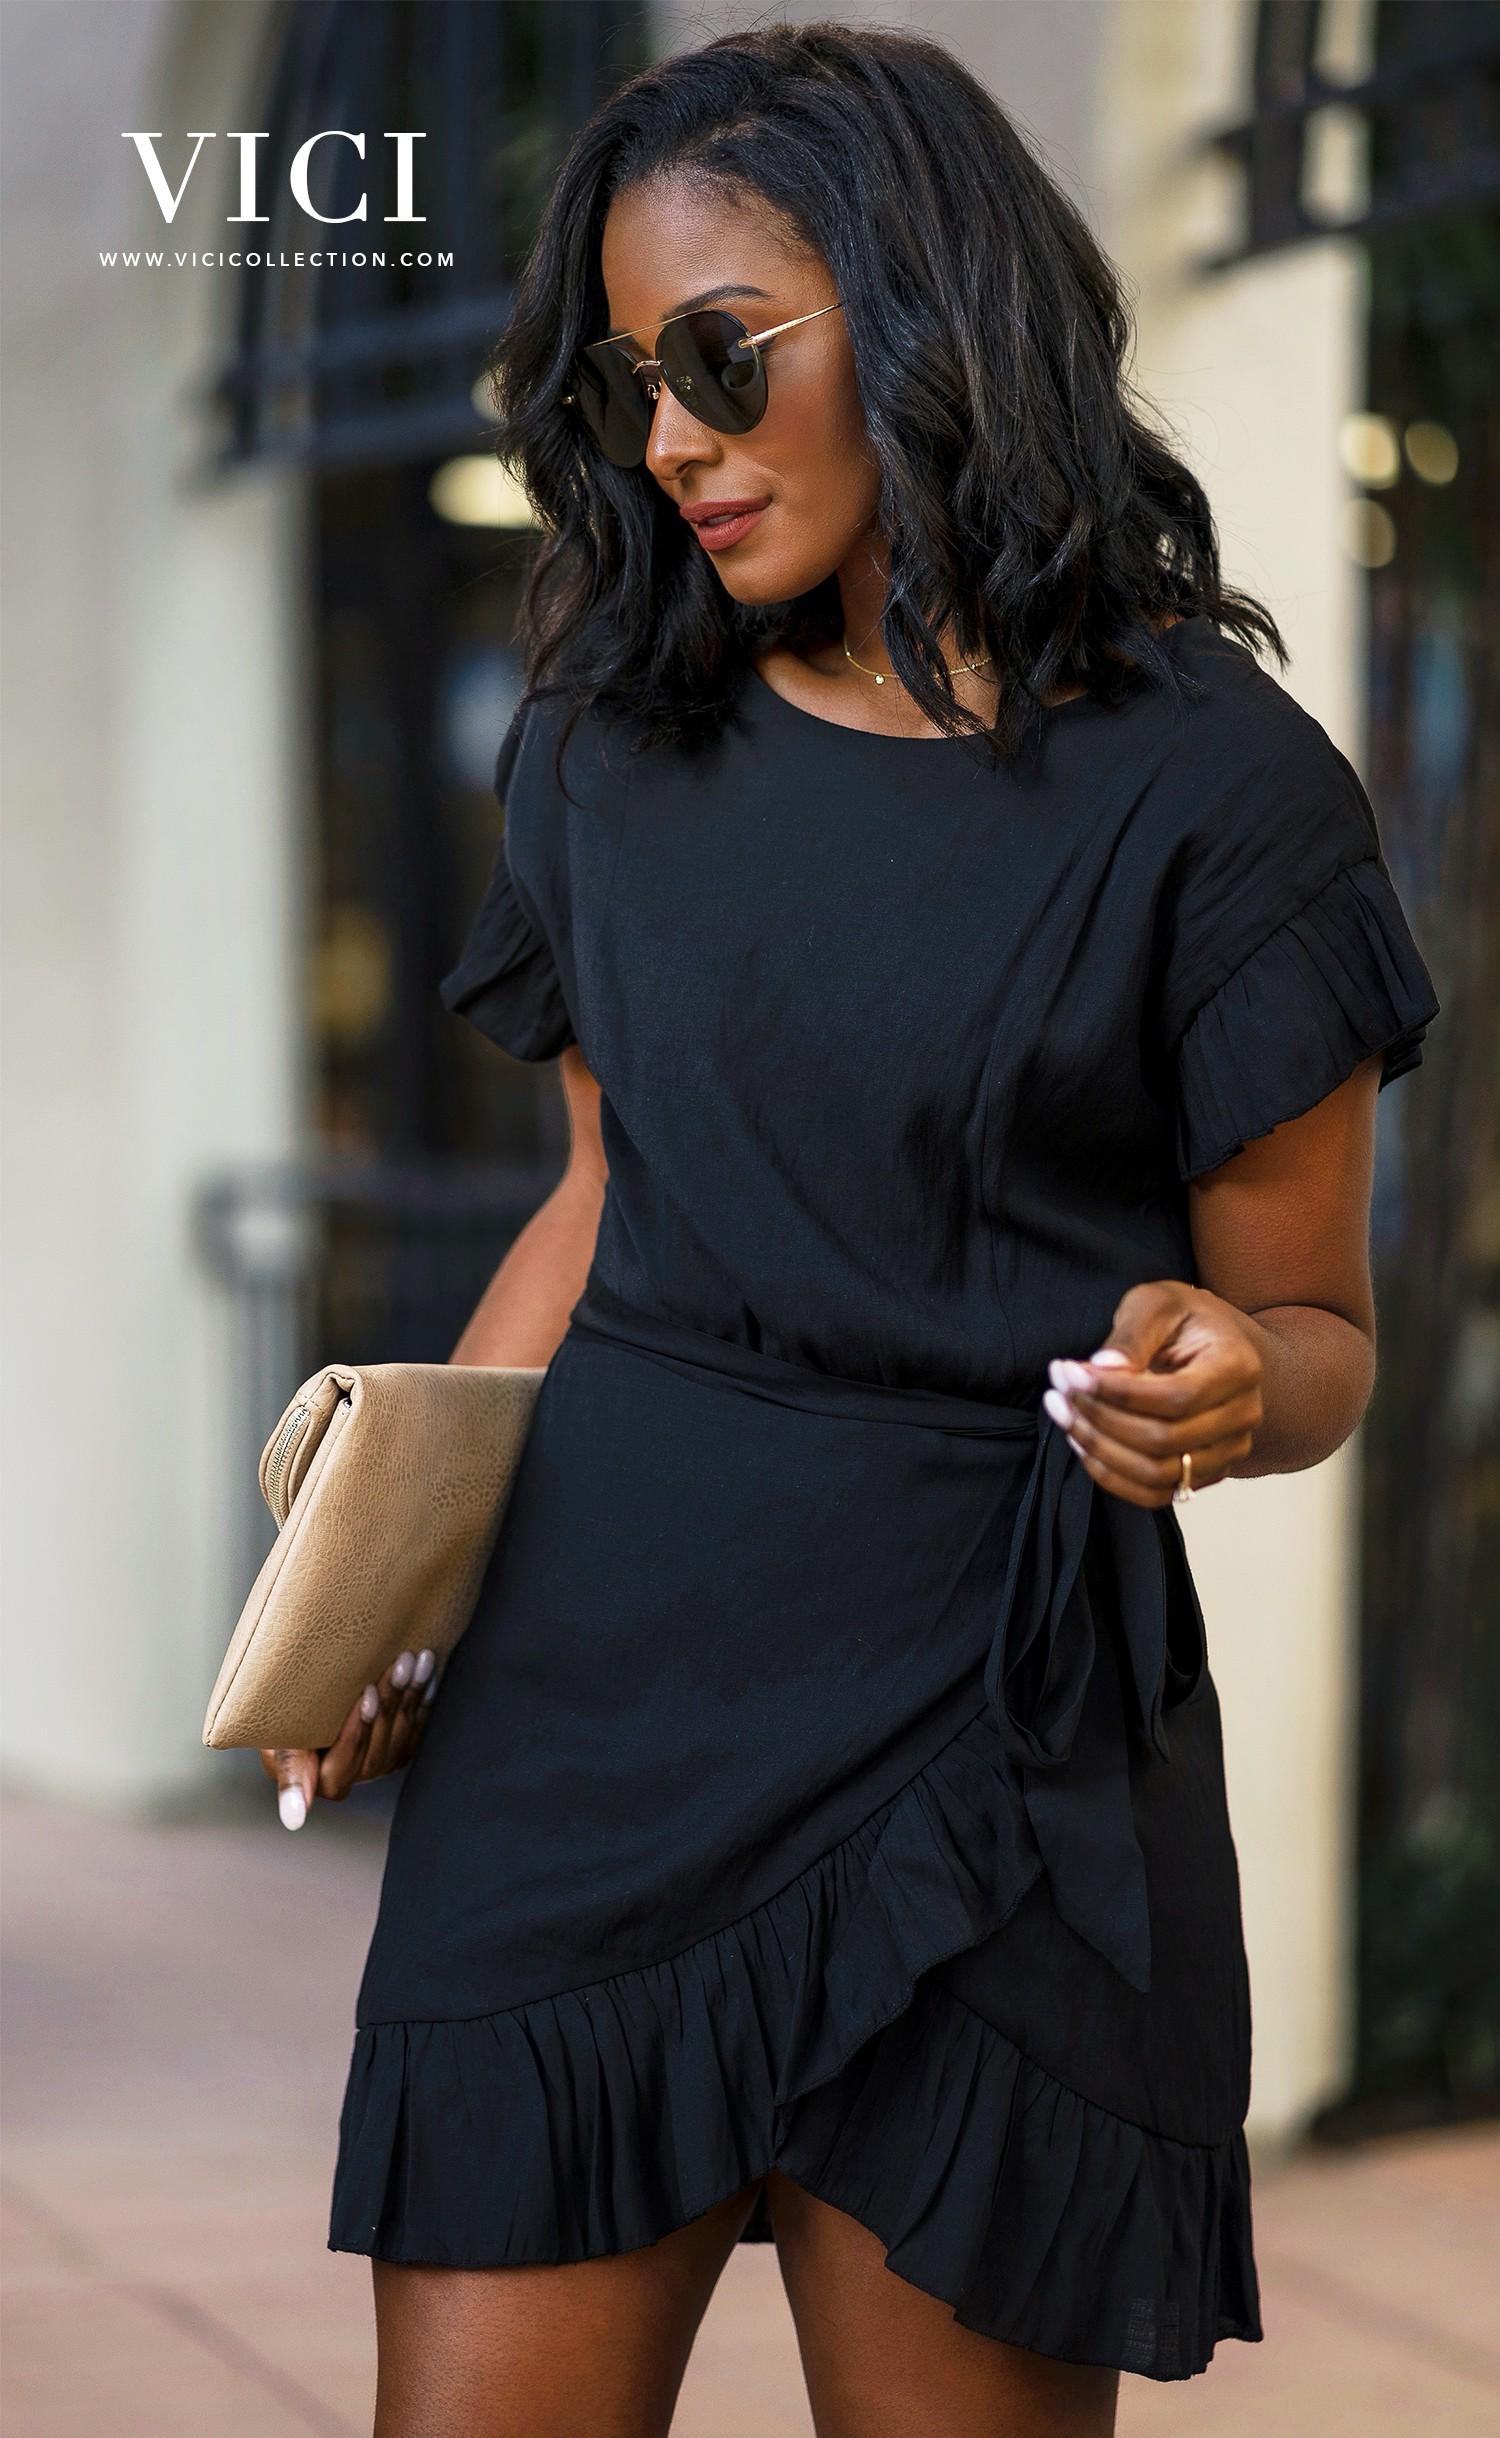 Clothing little black dress little black dress, cocktail dress